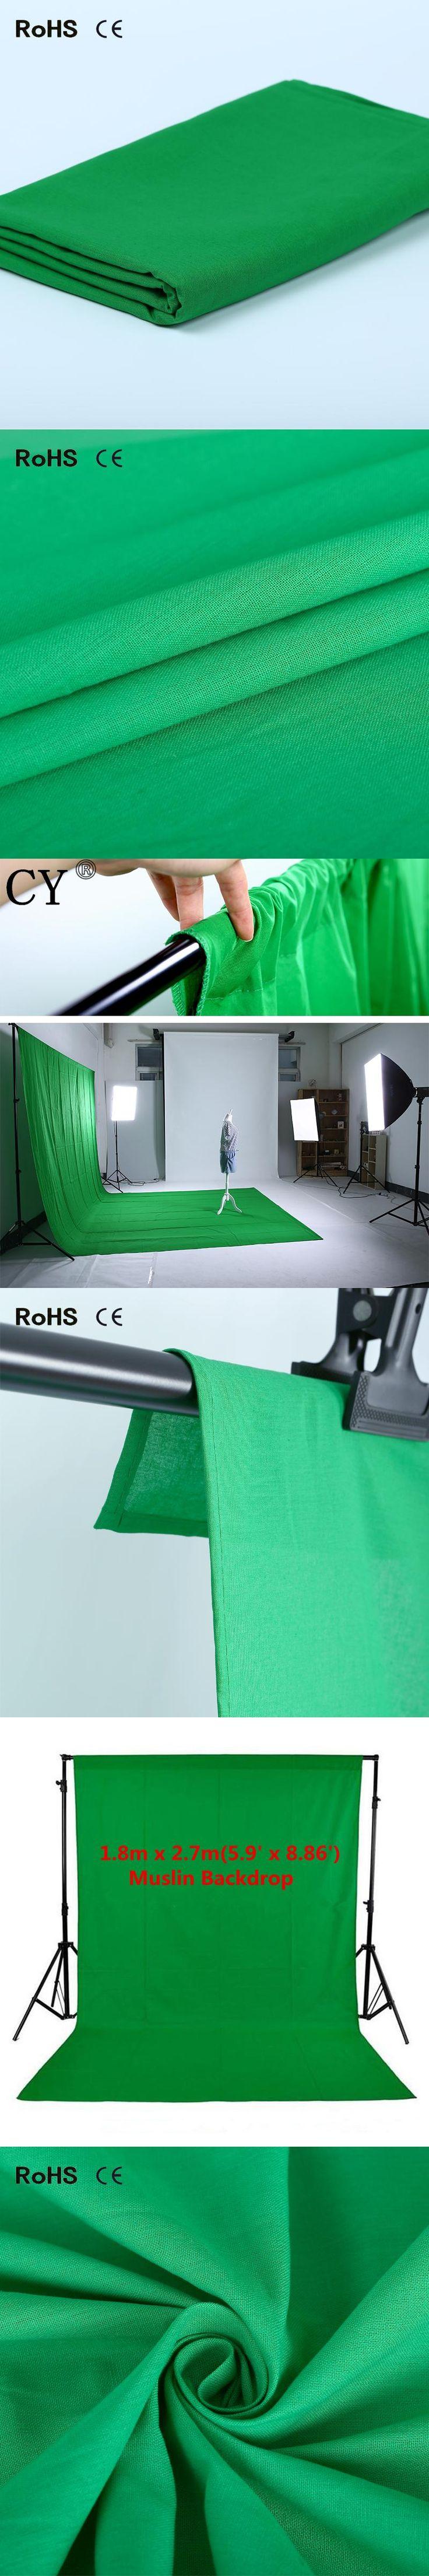 New Photo studio vedio photography 1.8m x 2.7m Photo Studio Solid Muslin Backdrop Background Green chromakey PSB3C chroma key